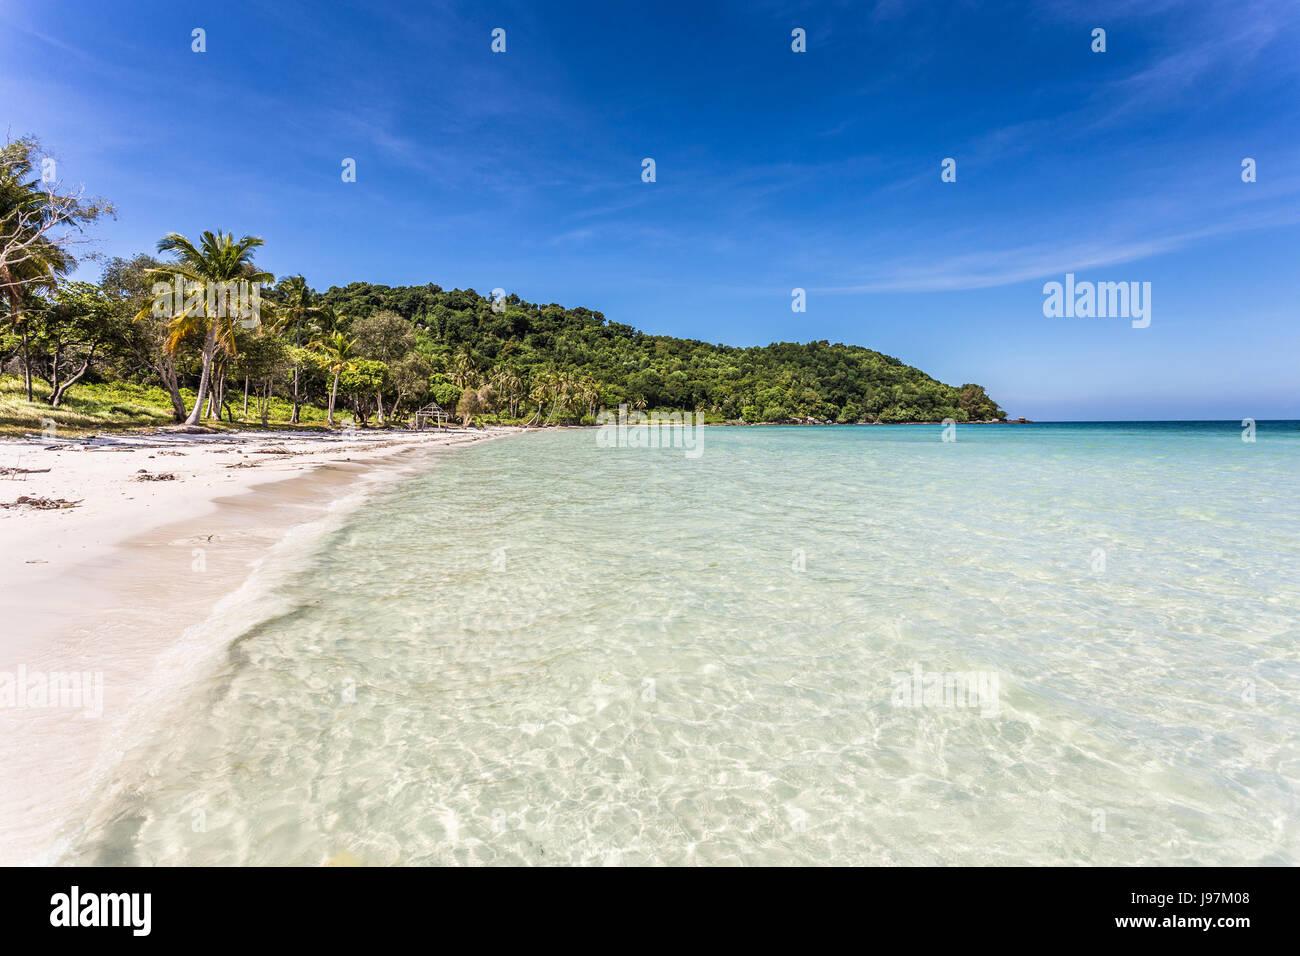 Splendide spiagge di sabbia bianca nome Bai Sao beach in l'isola di Phu Quoc in Vietnam del sud nel Golfo di Immagini Stock